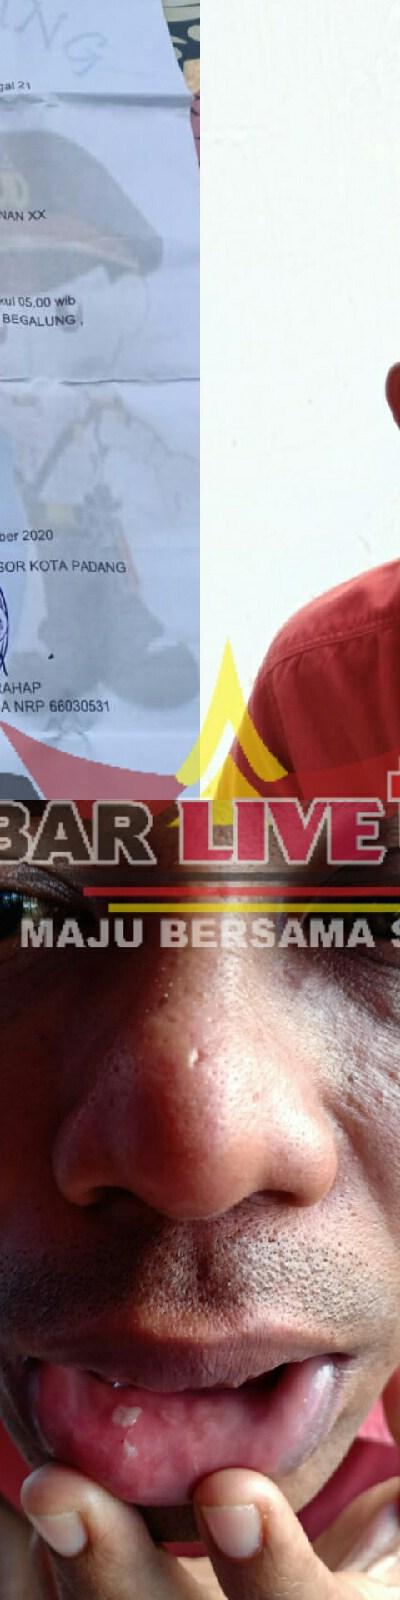 Salah Tangkap Korban dan Korban Melapor ke Polresta Padang